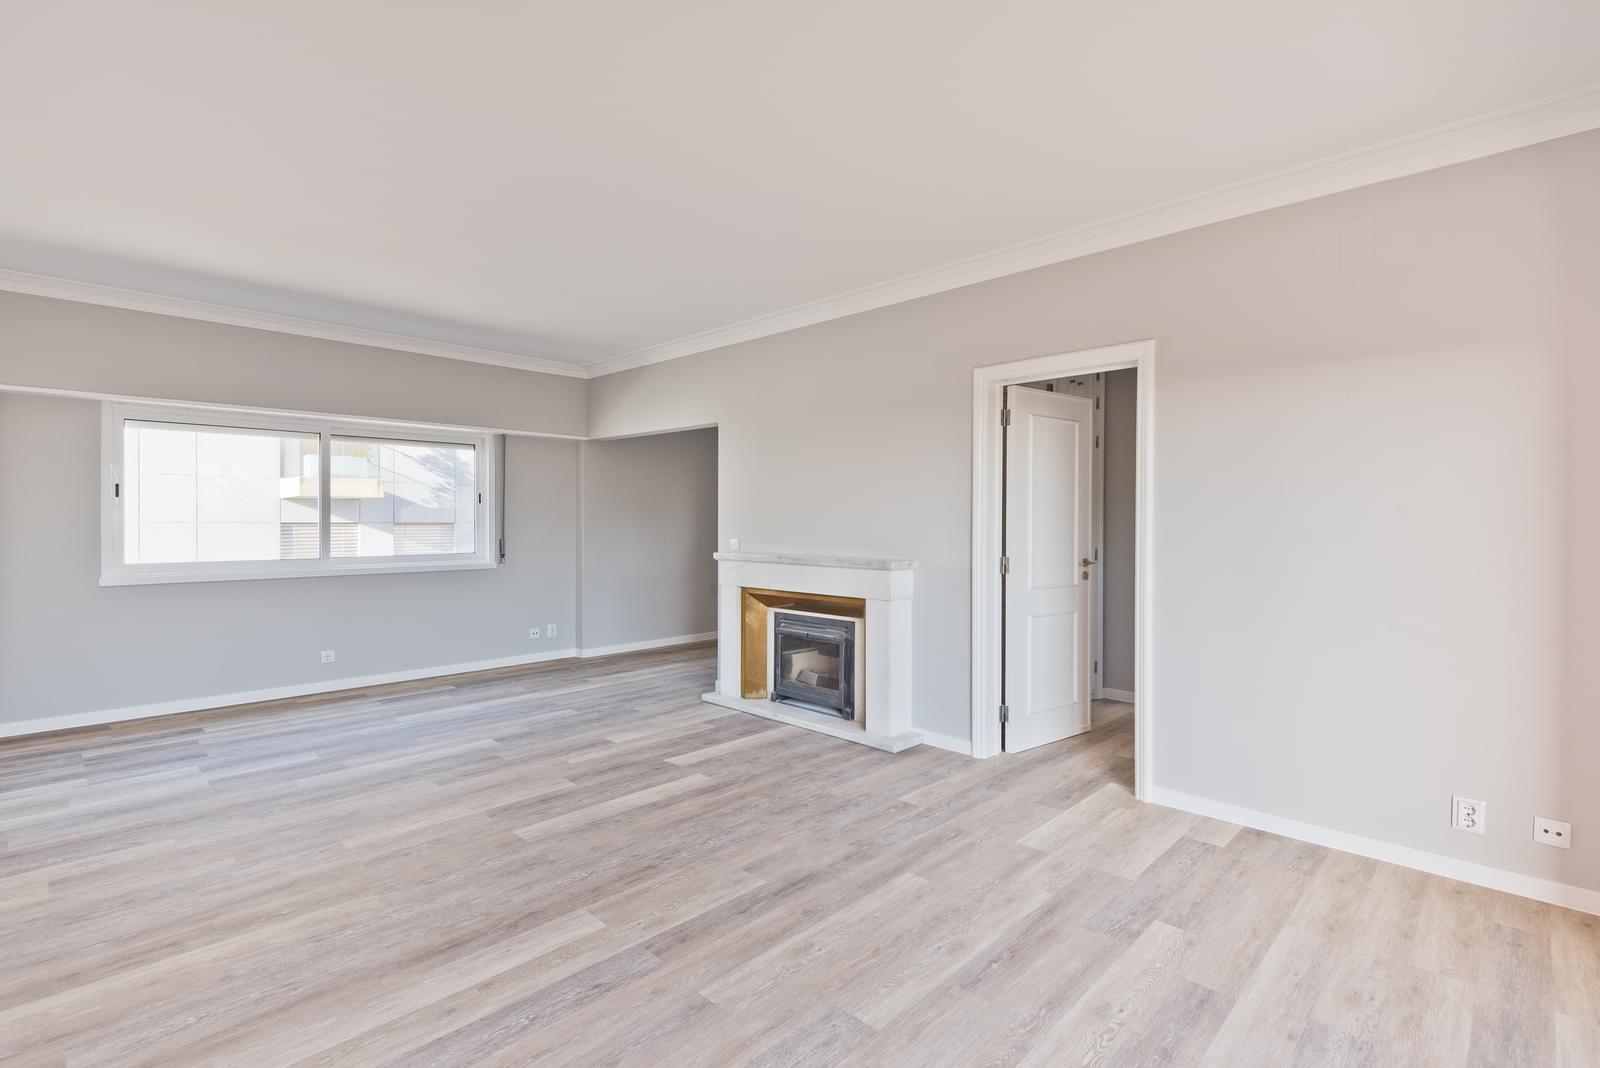 pf18956-apartamento-t3-1-cascais-2d6e003c-fb7e-419d-b702-771bbfc1b0bb